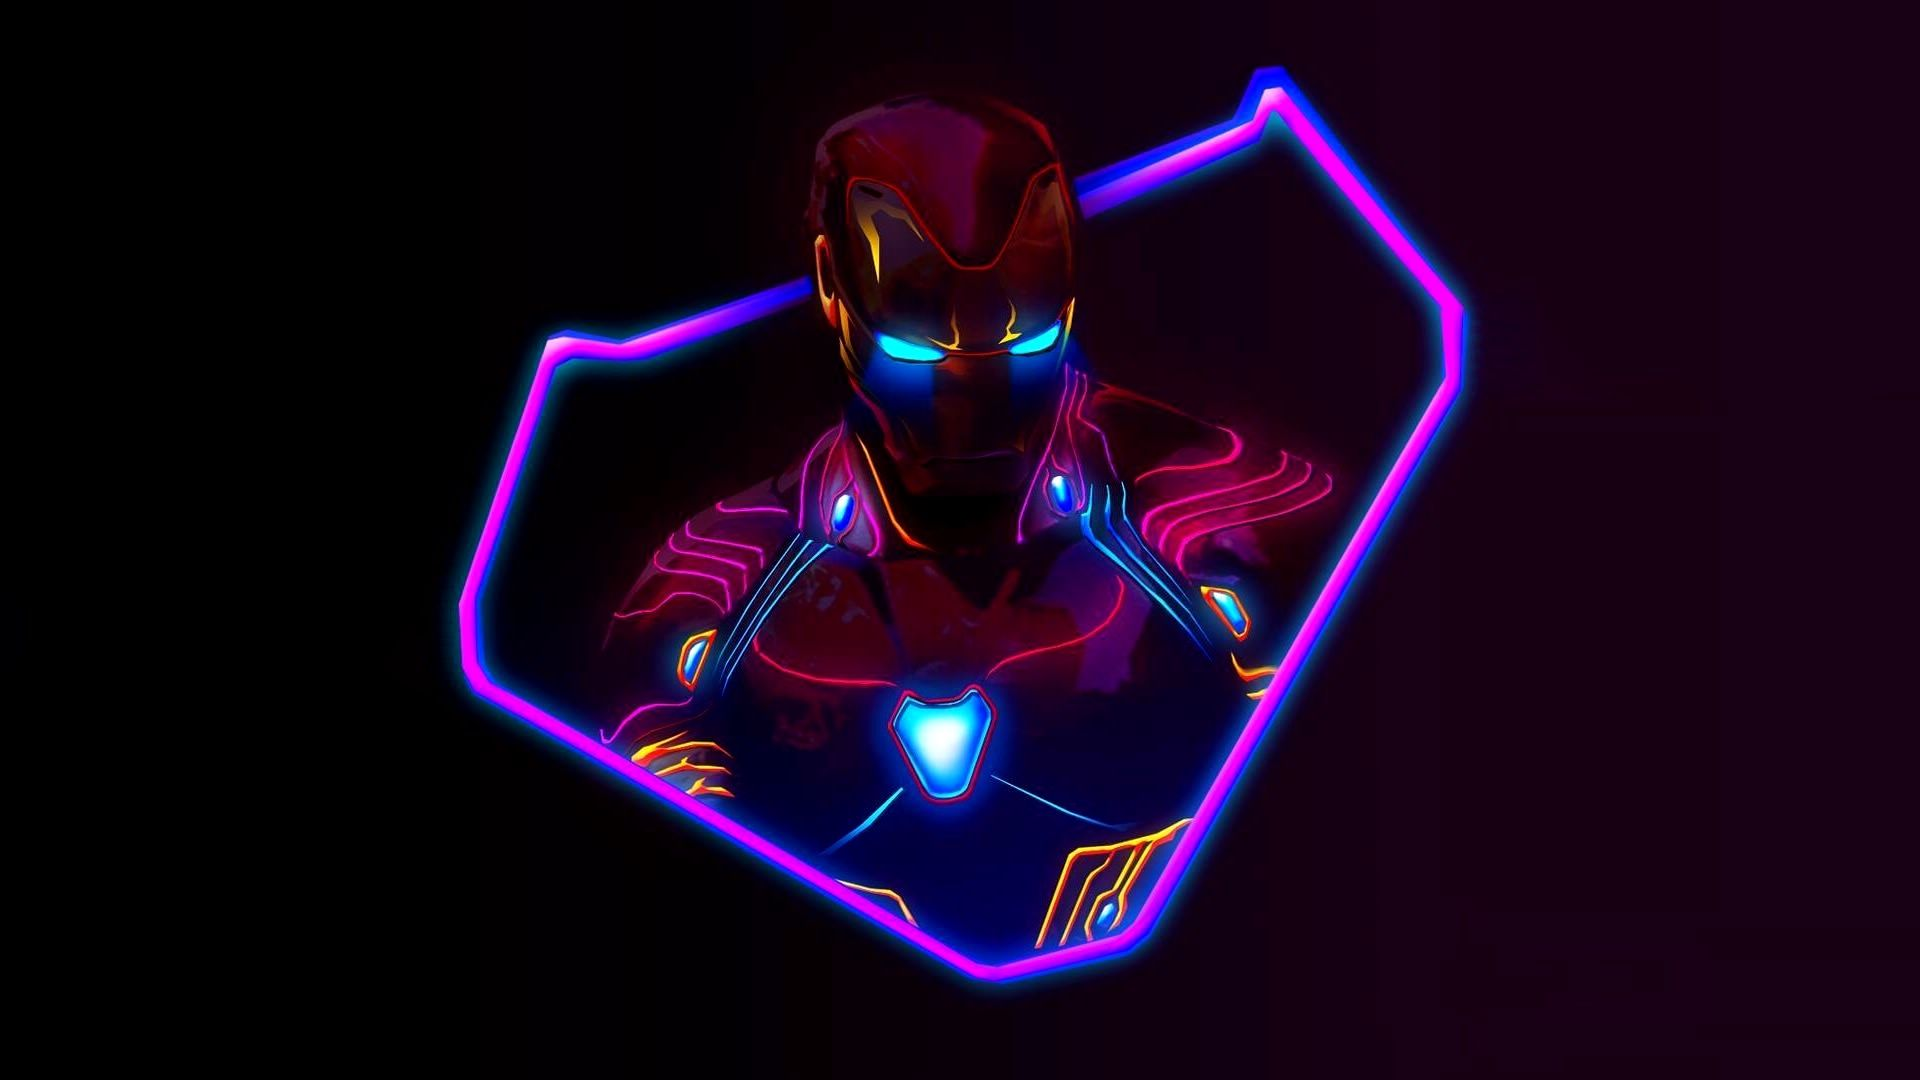 4K Wallpaper For Pc Marvel Gallery in 2020 | Neon ...